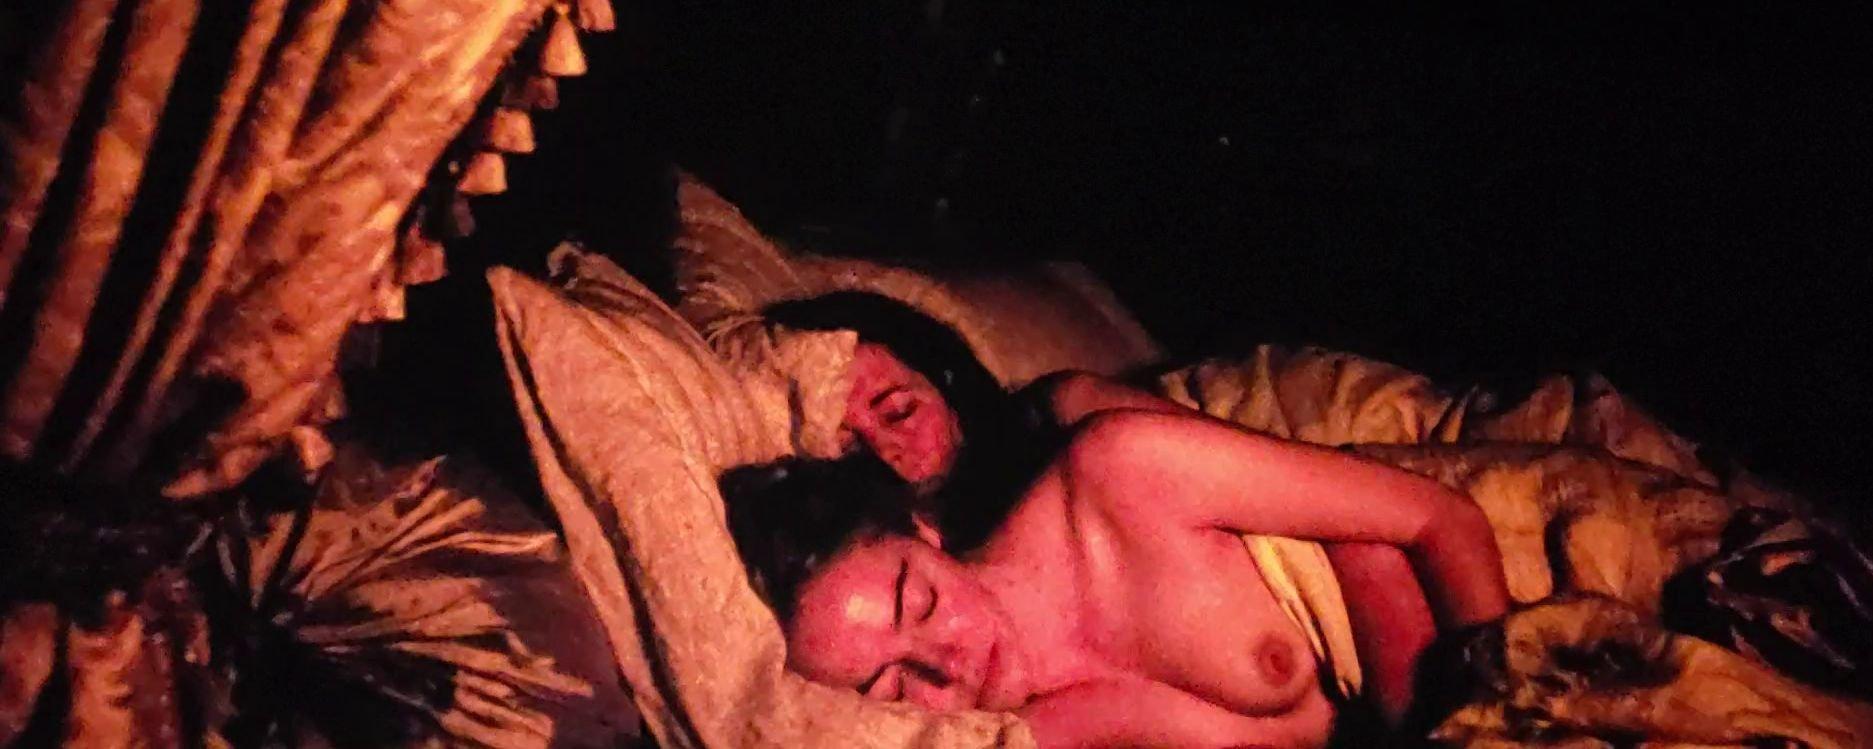 emma stone nude video